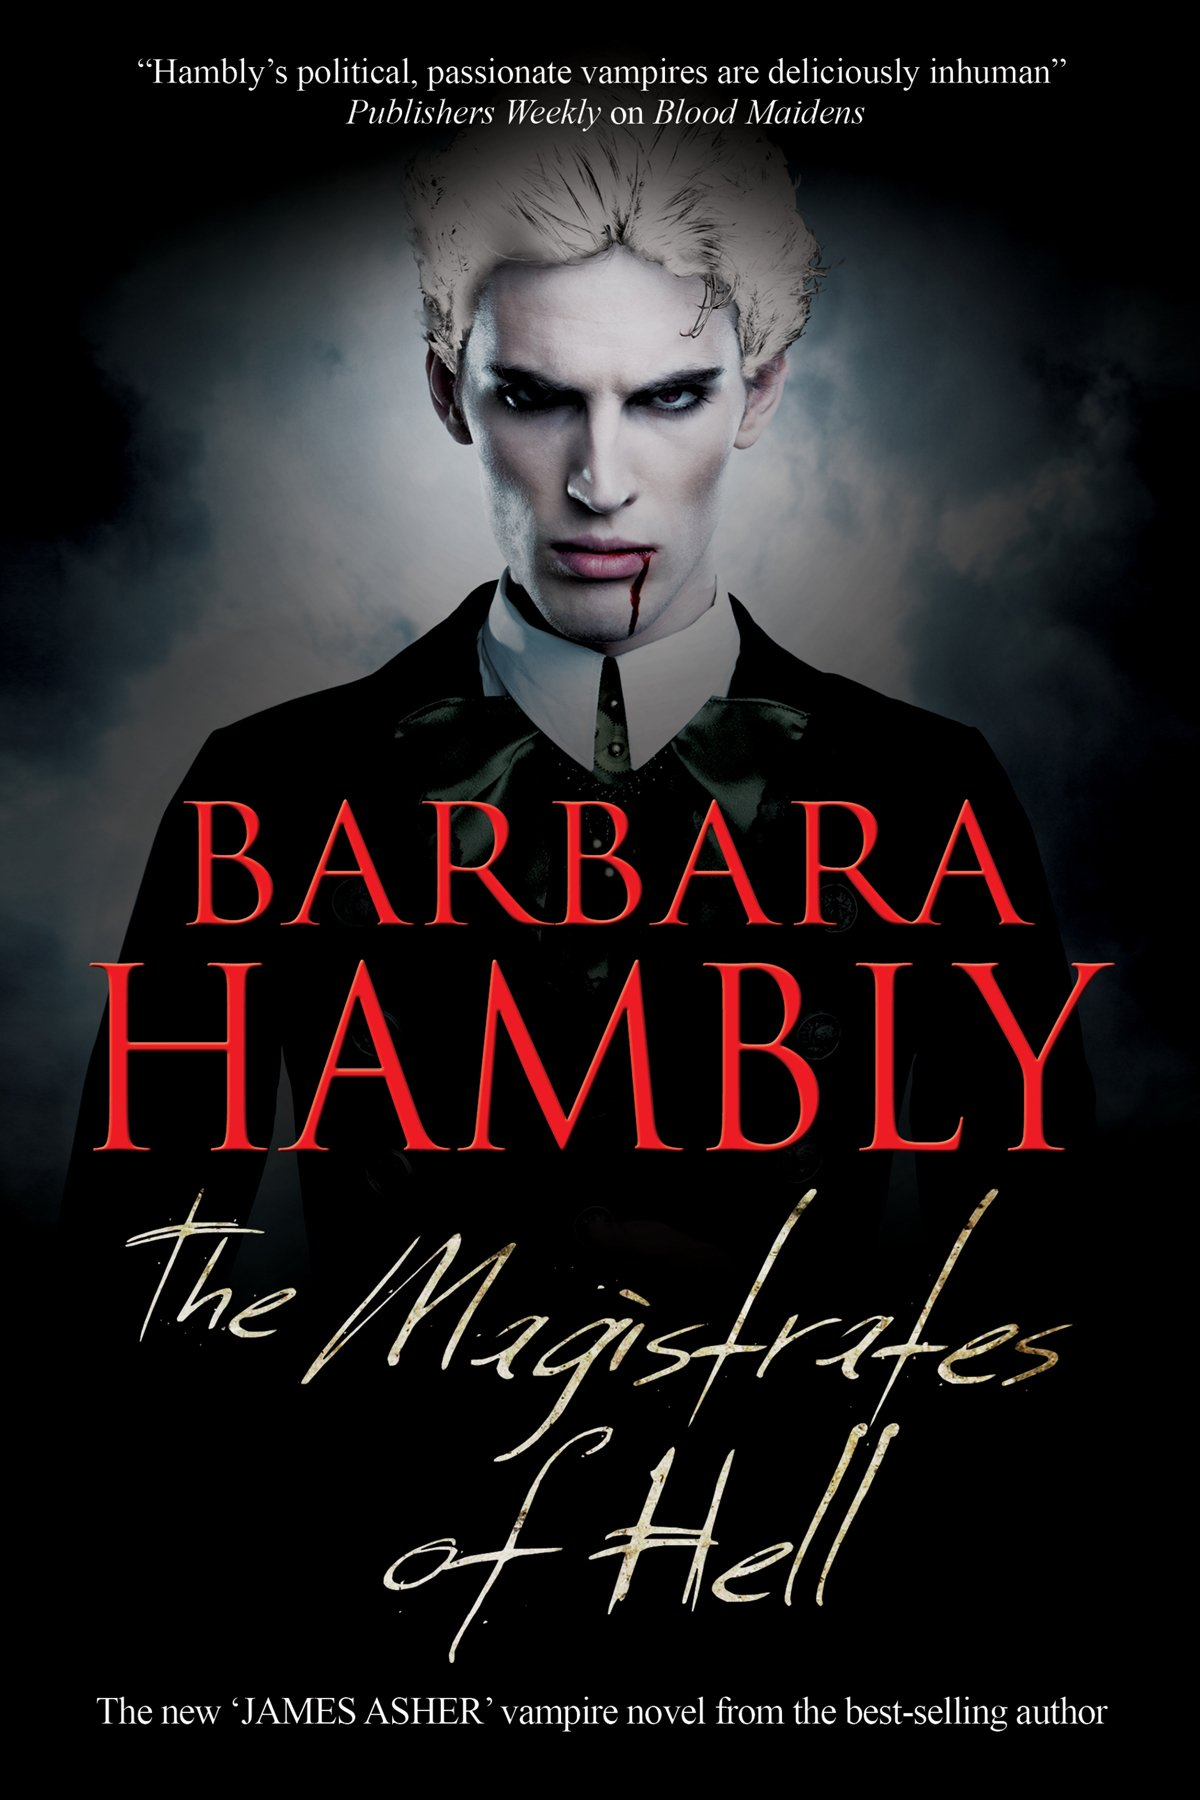 Download Magistrates of Hell (A James Asher Vampire Novel) pdf epub